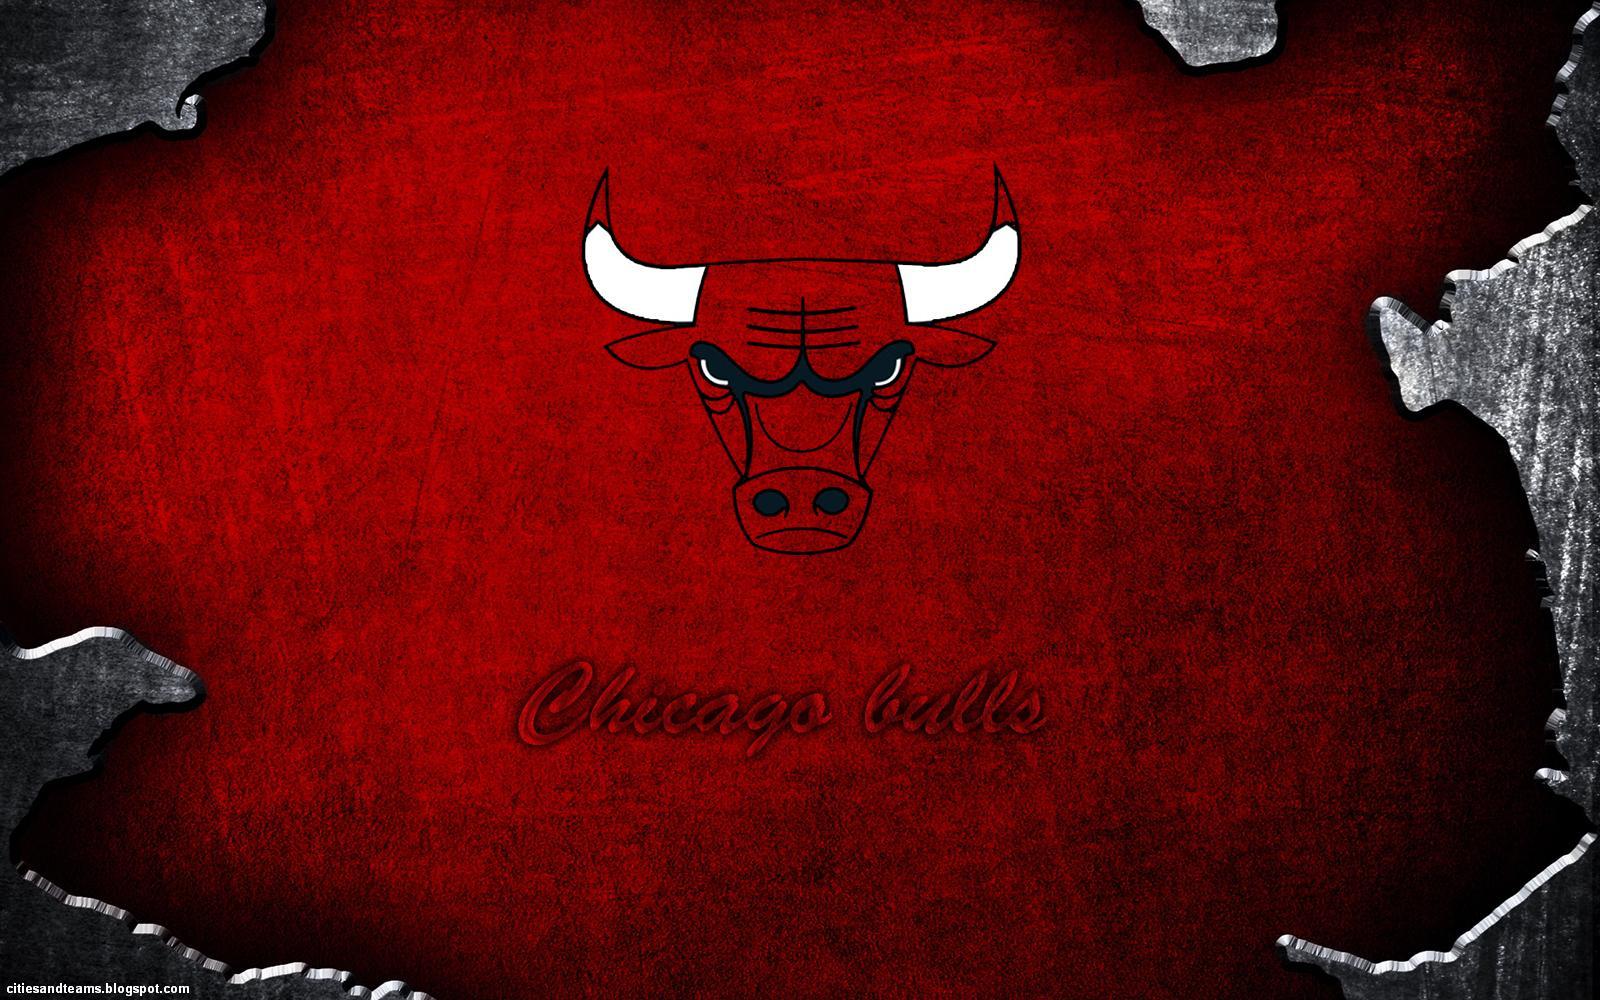 http://1.bp.blogspot.com/-u__816q5iwE/UNx5Vzar-0I/AAAAAAAAJI8/RKX9rC8GpKc/s1600/Chicago_Bulls_2013_Logo_Nba_Illinois_USA_Hd_Desktop_Wallpaper_citiesandteams.blogspot.com.jpg